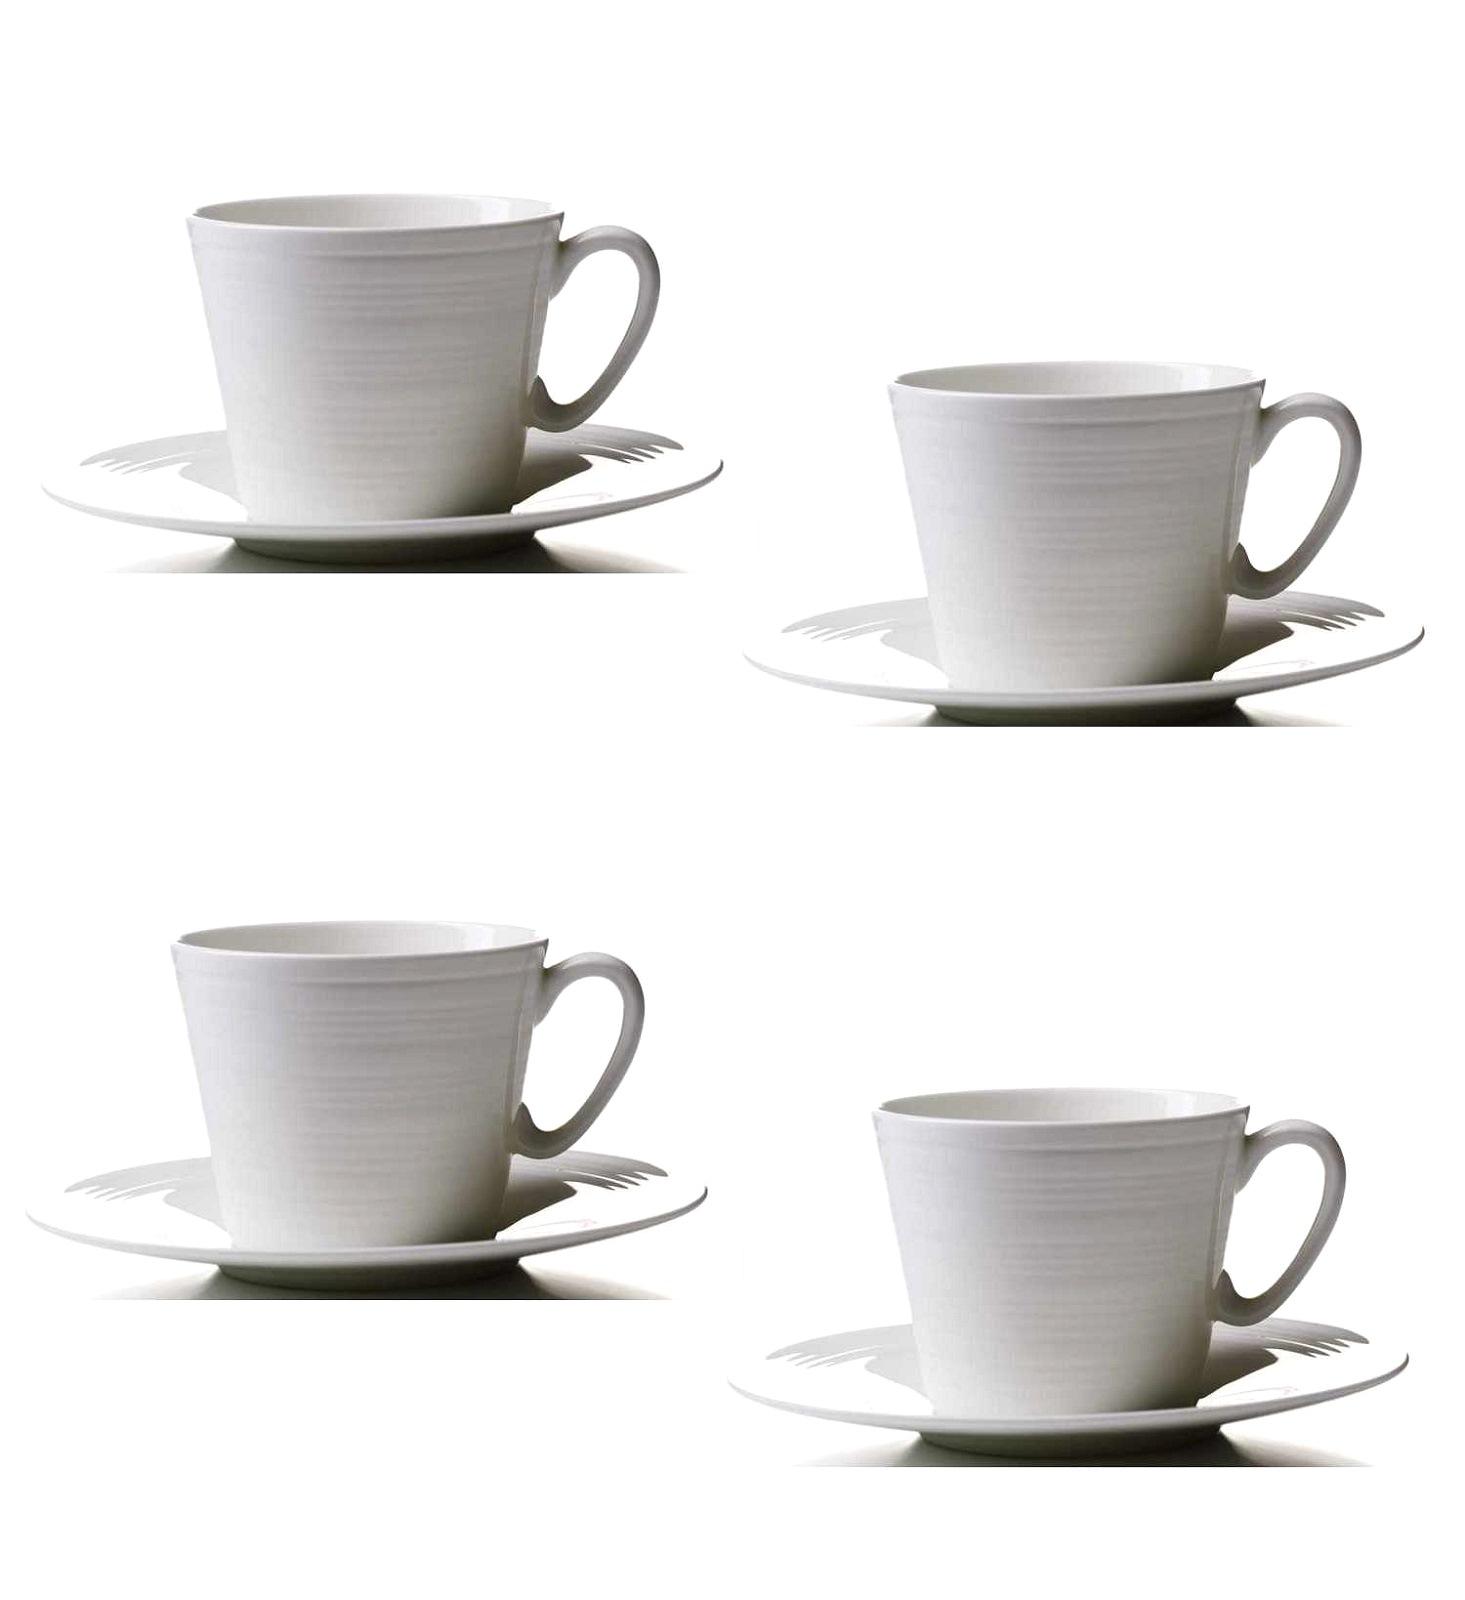 Набор: чашка с блюдцем Aida Passion, объем 0,3 л, белый, 4 комплекта Aida 19280 фото 0